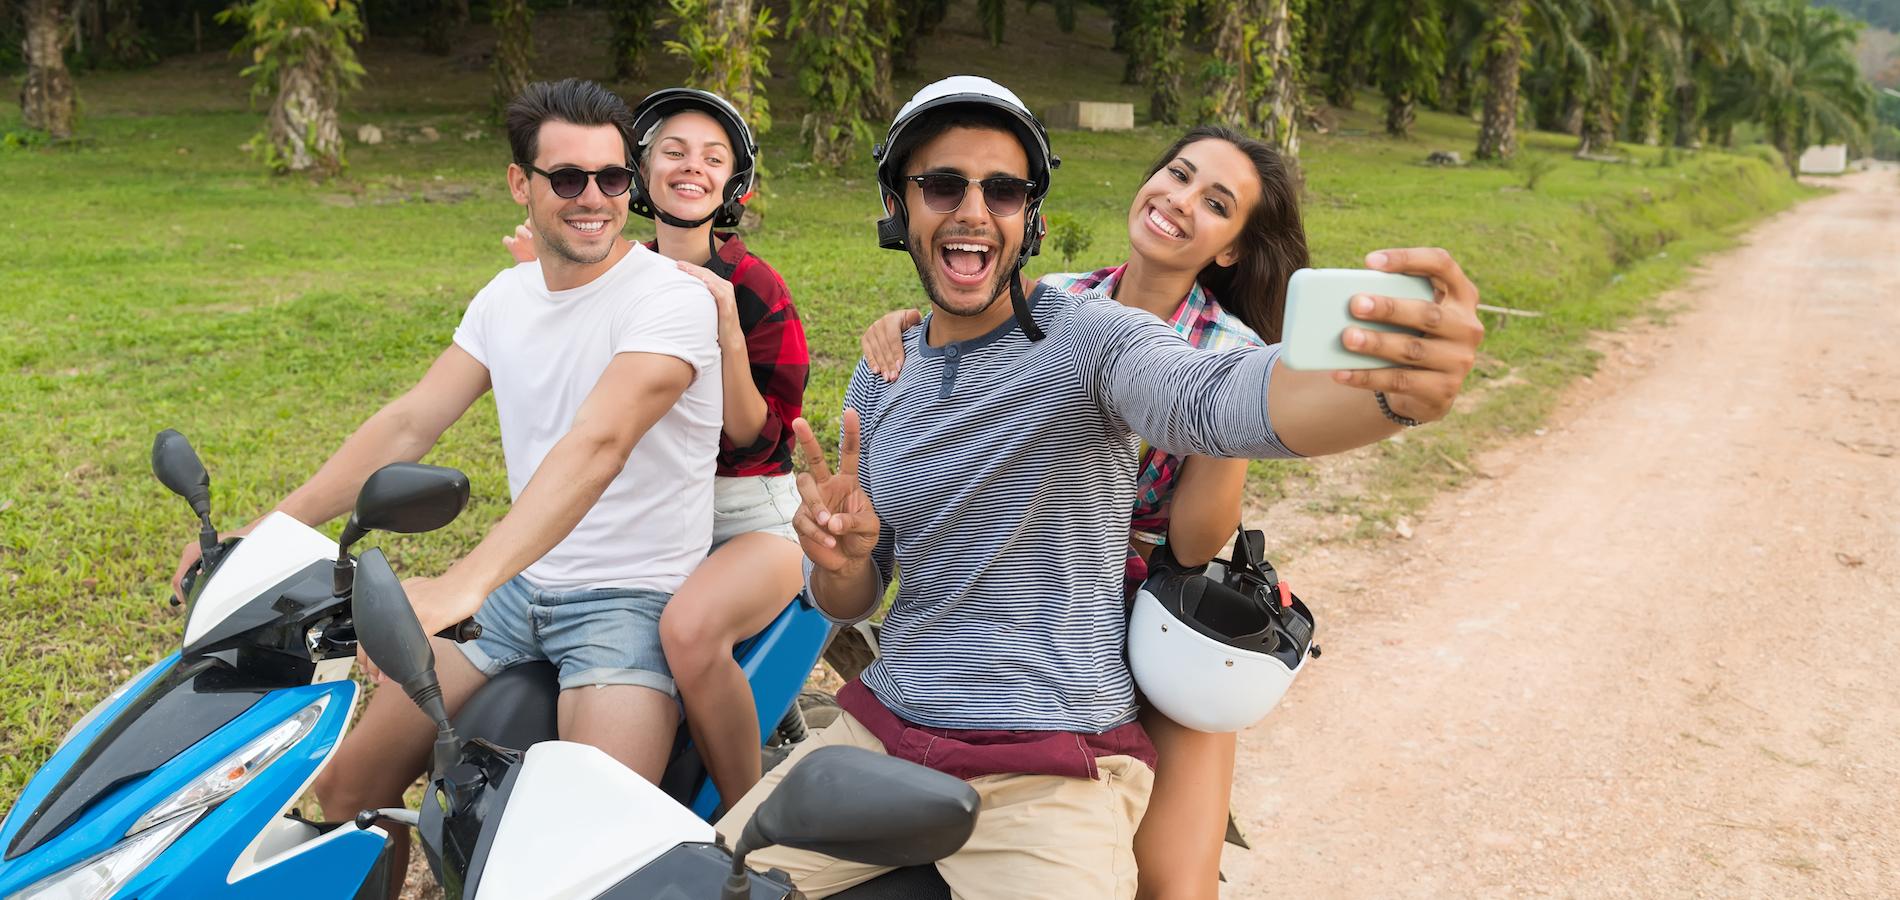 two-couple-riding-motorbike-man-and-woman-taking-2021-04-06-12-02-37-utc